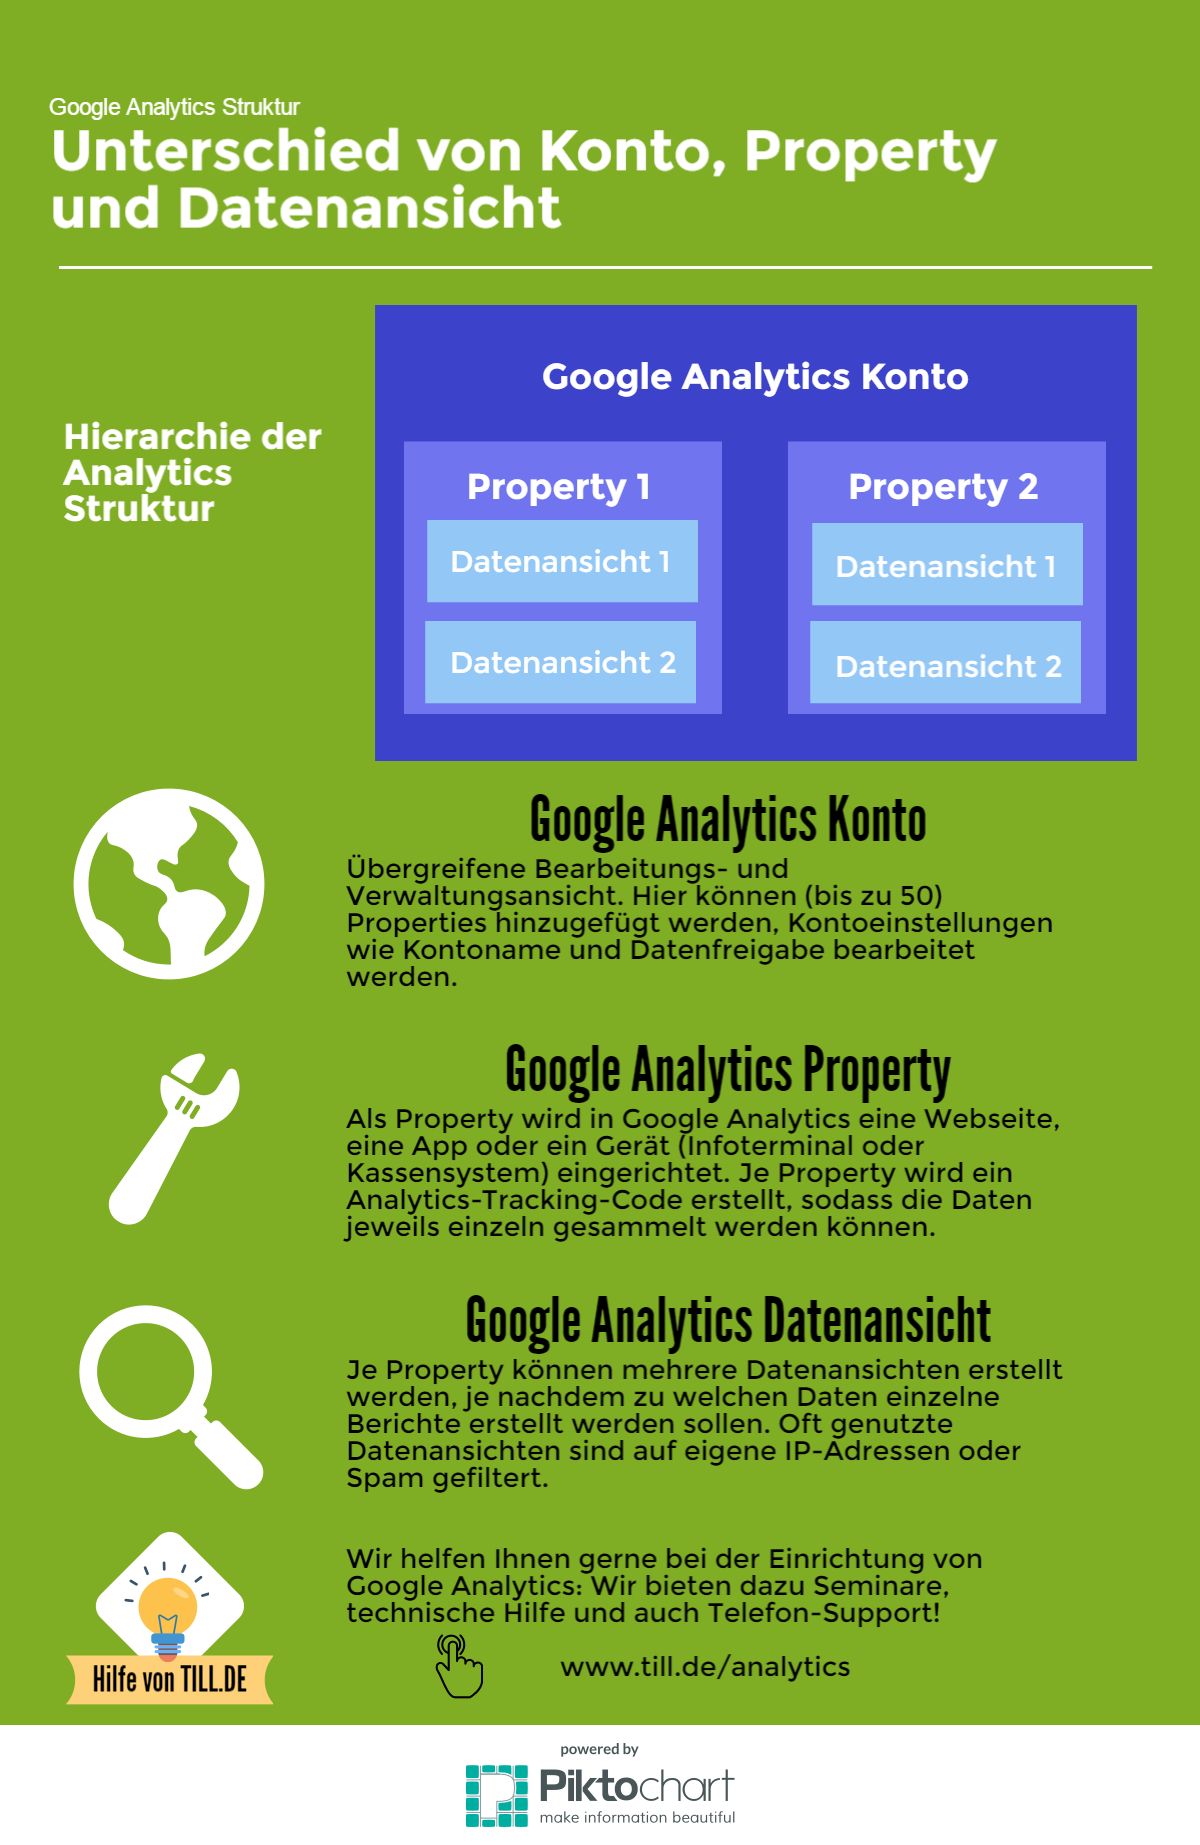 TILL.DE-Infographic-Google-Analytics_Konto_Property_Datenansicht